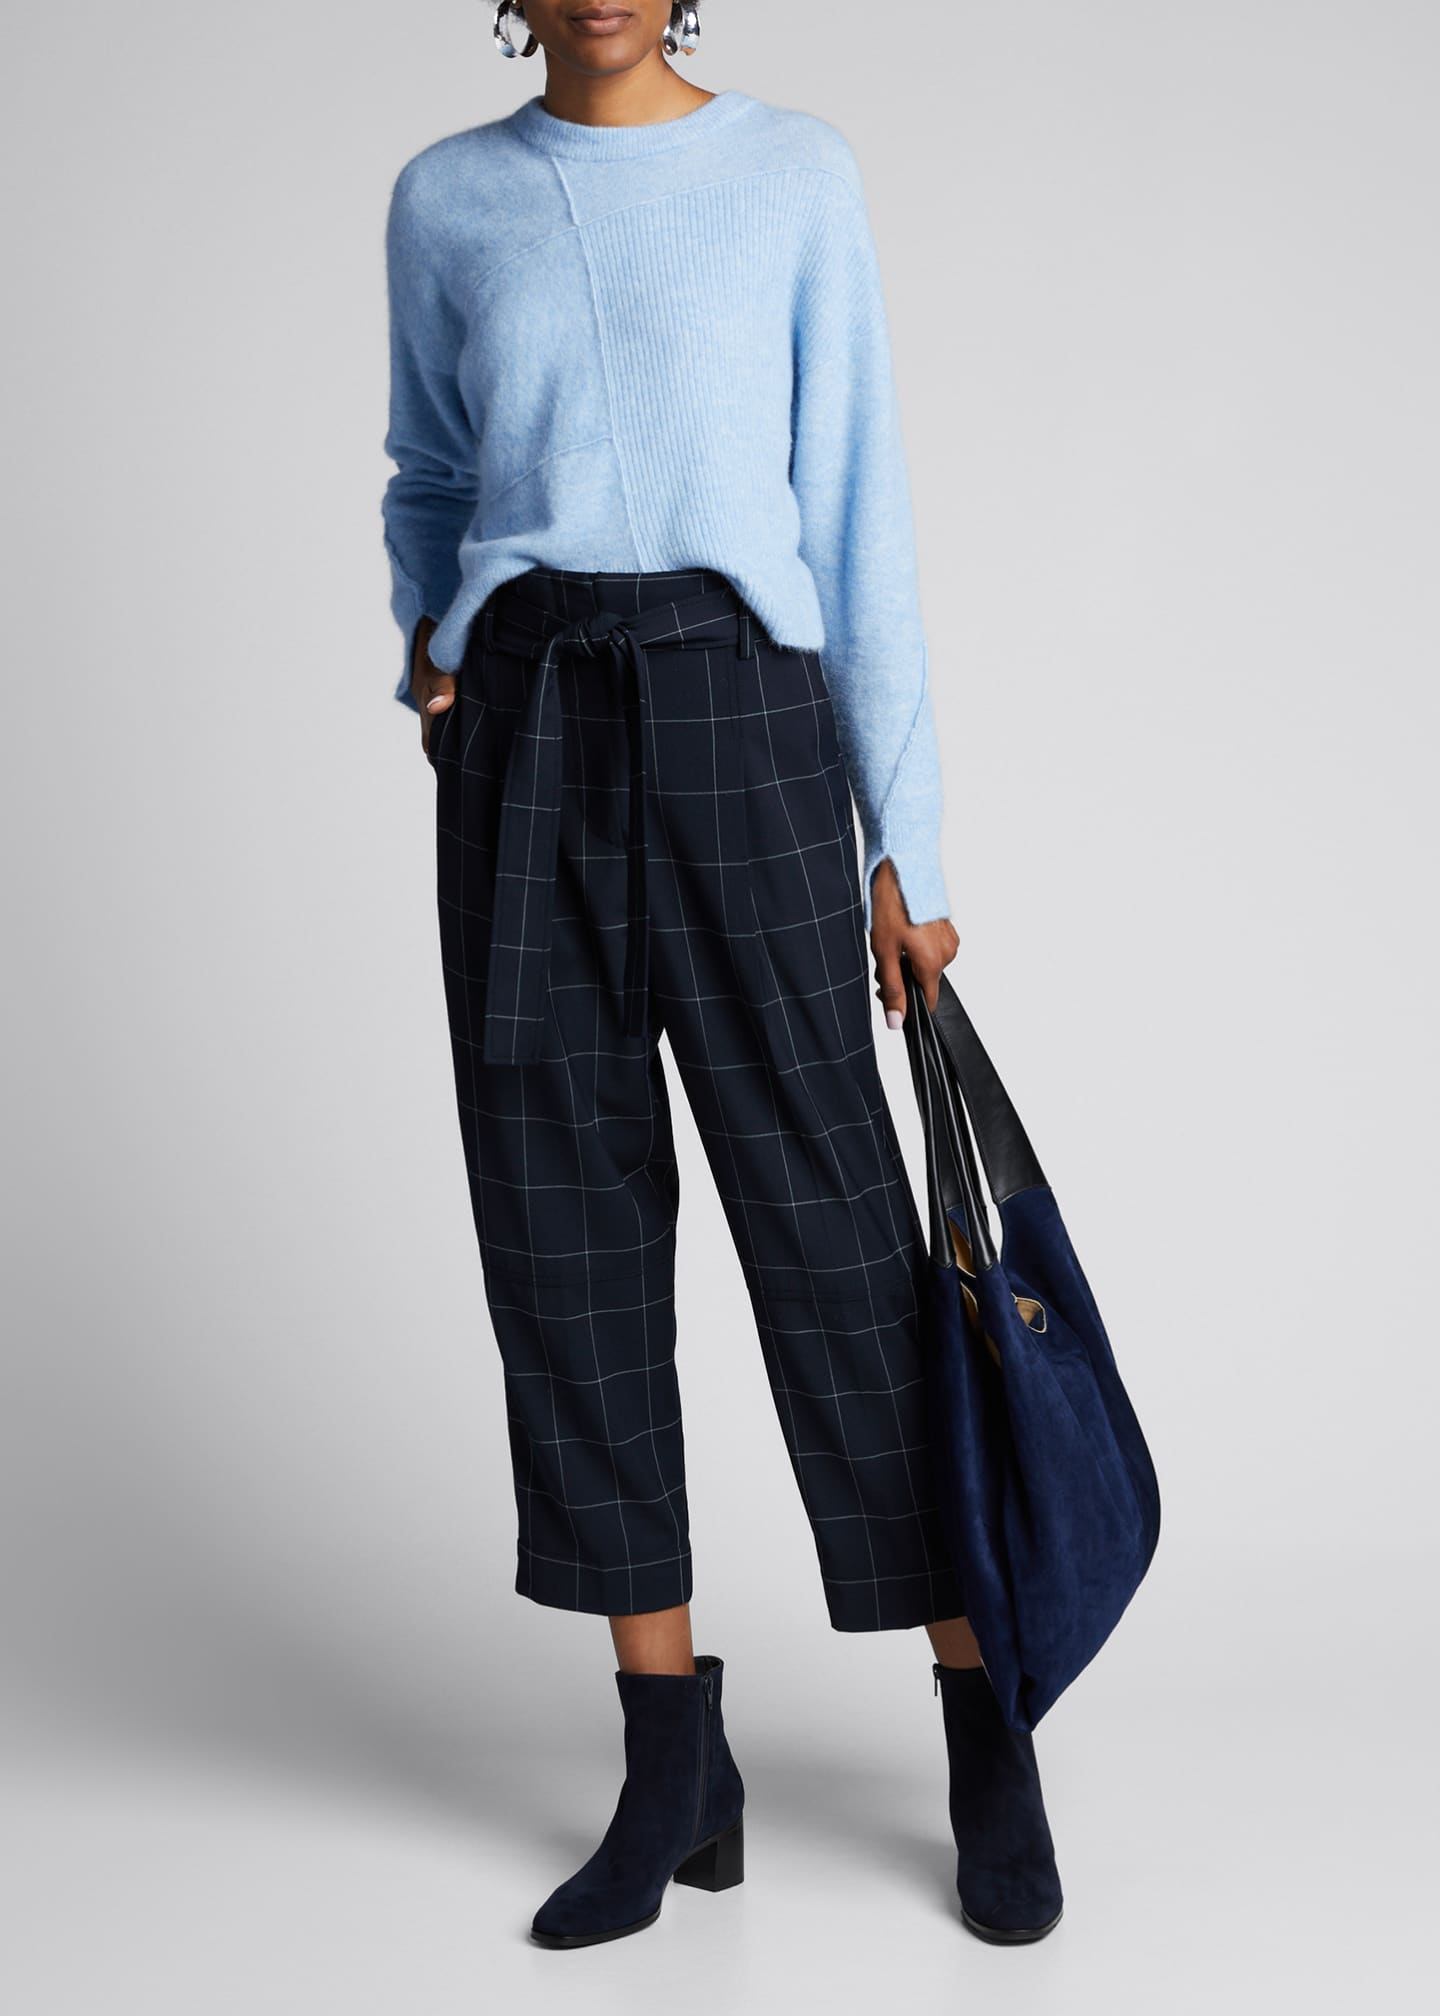 3.1 Phillip Lim Windowpane Belted Menswear Pants